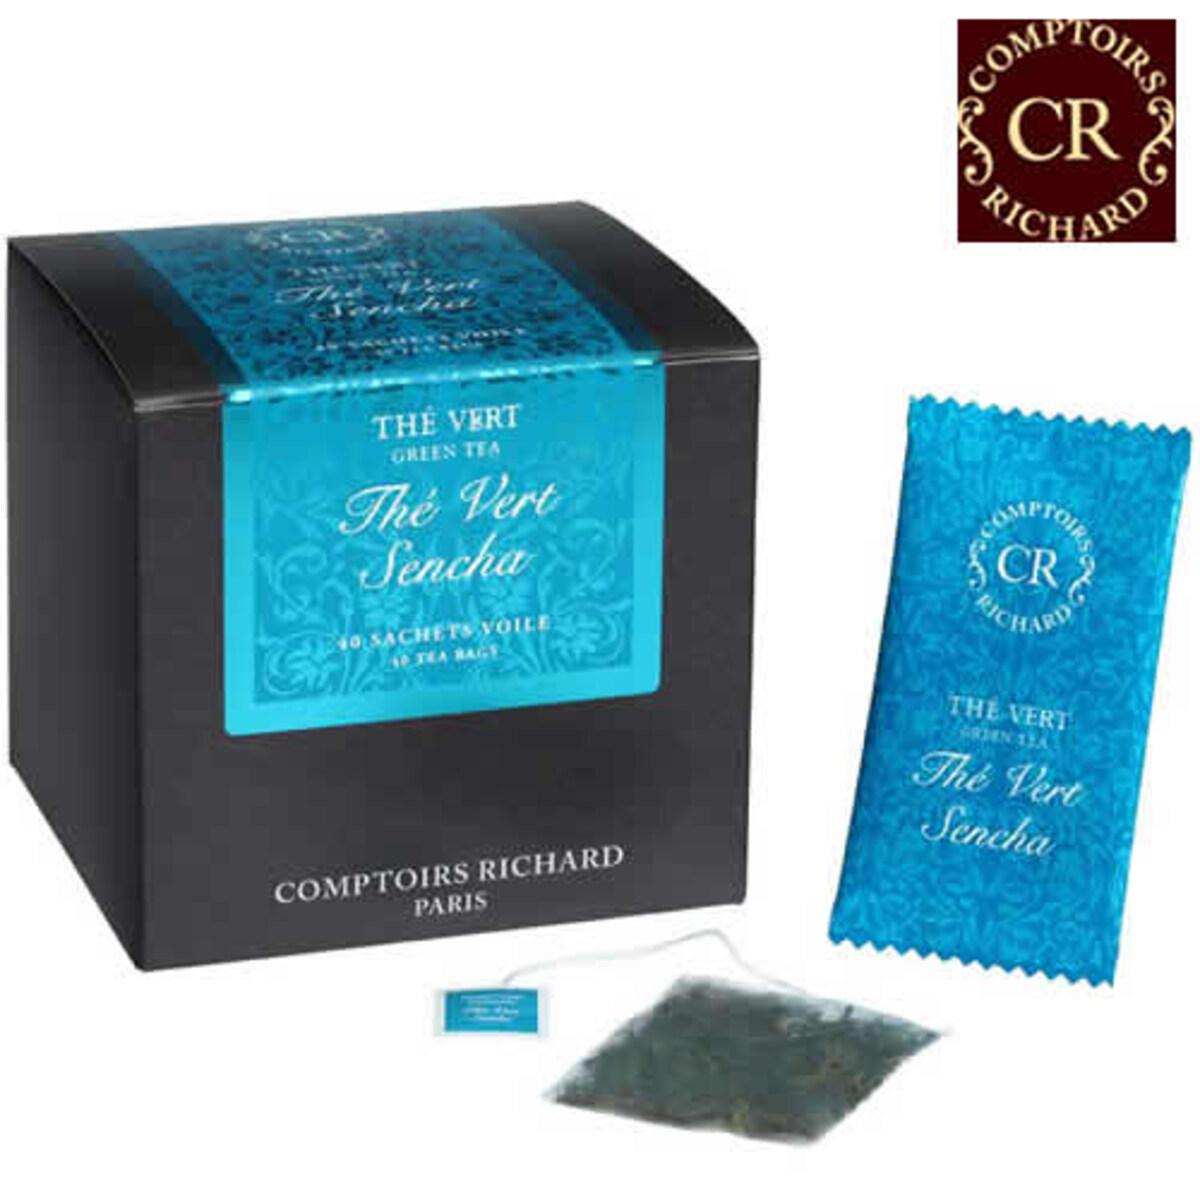 Comptoirs Richard Thé Vert Sencha - 40бр сашета  зелен чай сенча